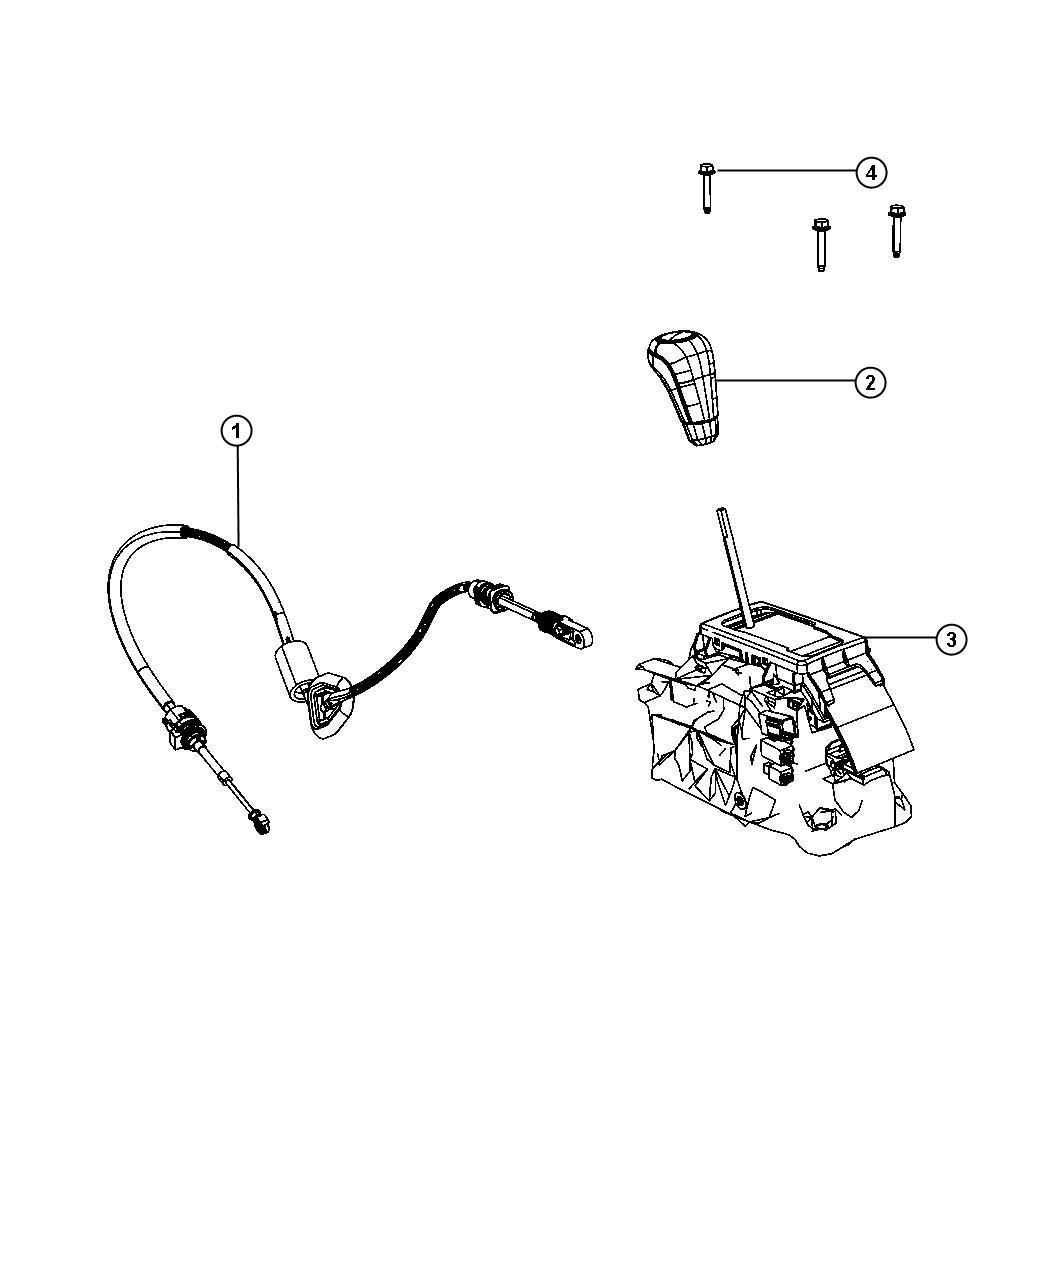 45rfe transmission fits on | wiring diagram database on 545rfe transmission  diagram, dodge 44re transmission